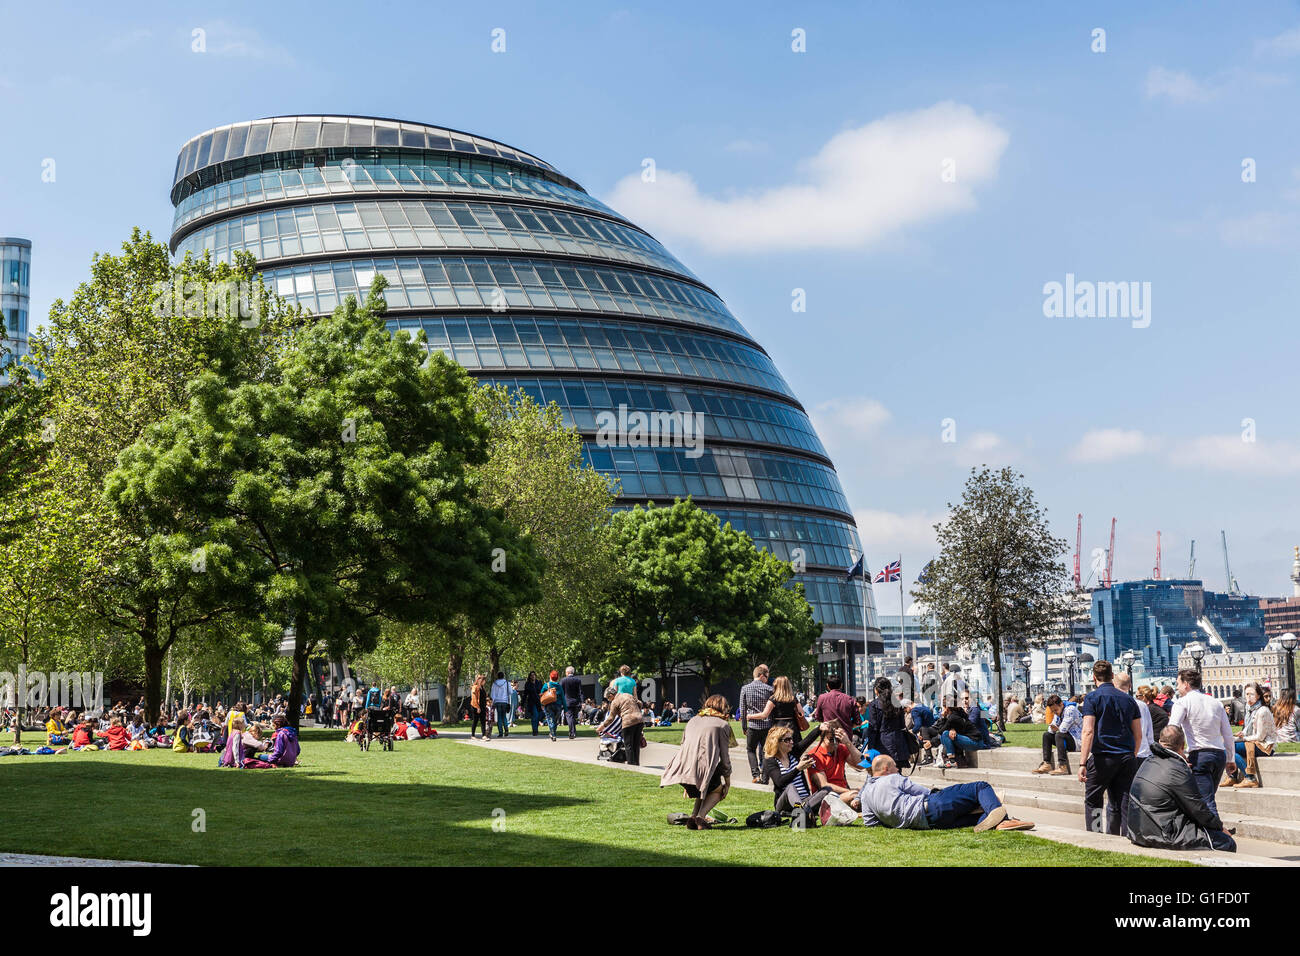 London City Hall (Assembly Building), Borough of Southwark, London, England, SE1, UK - Stock Image